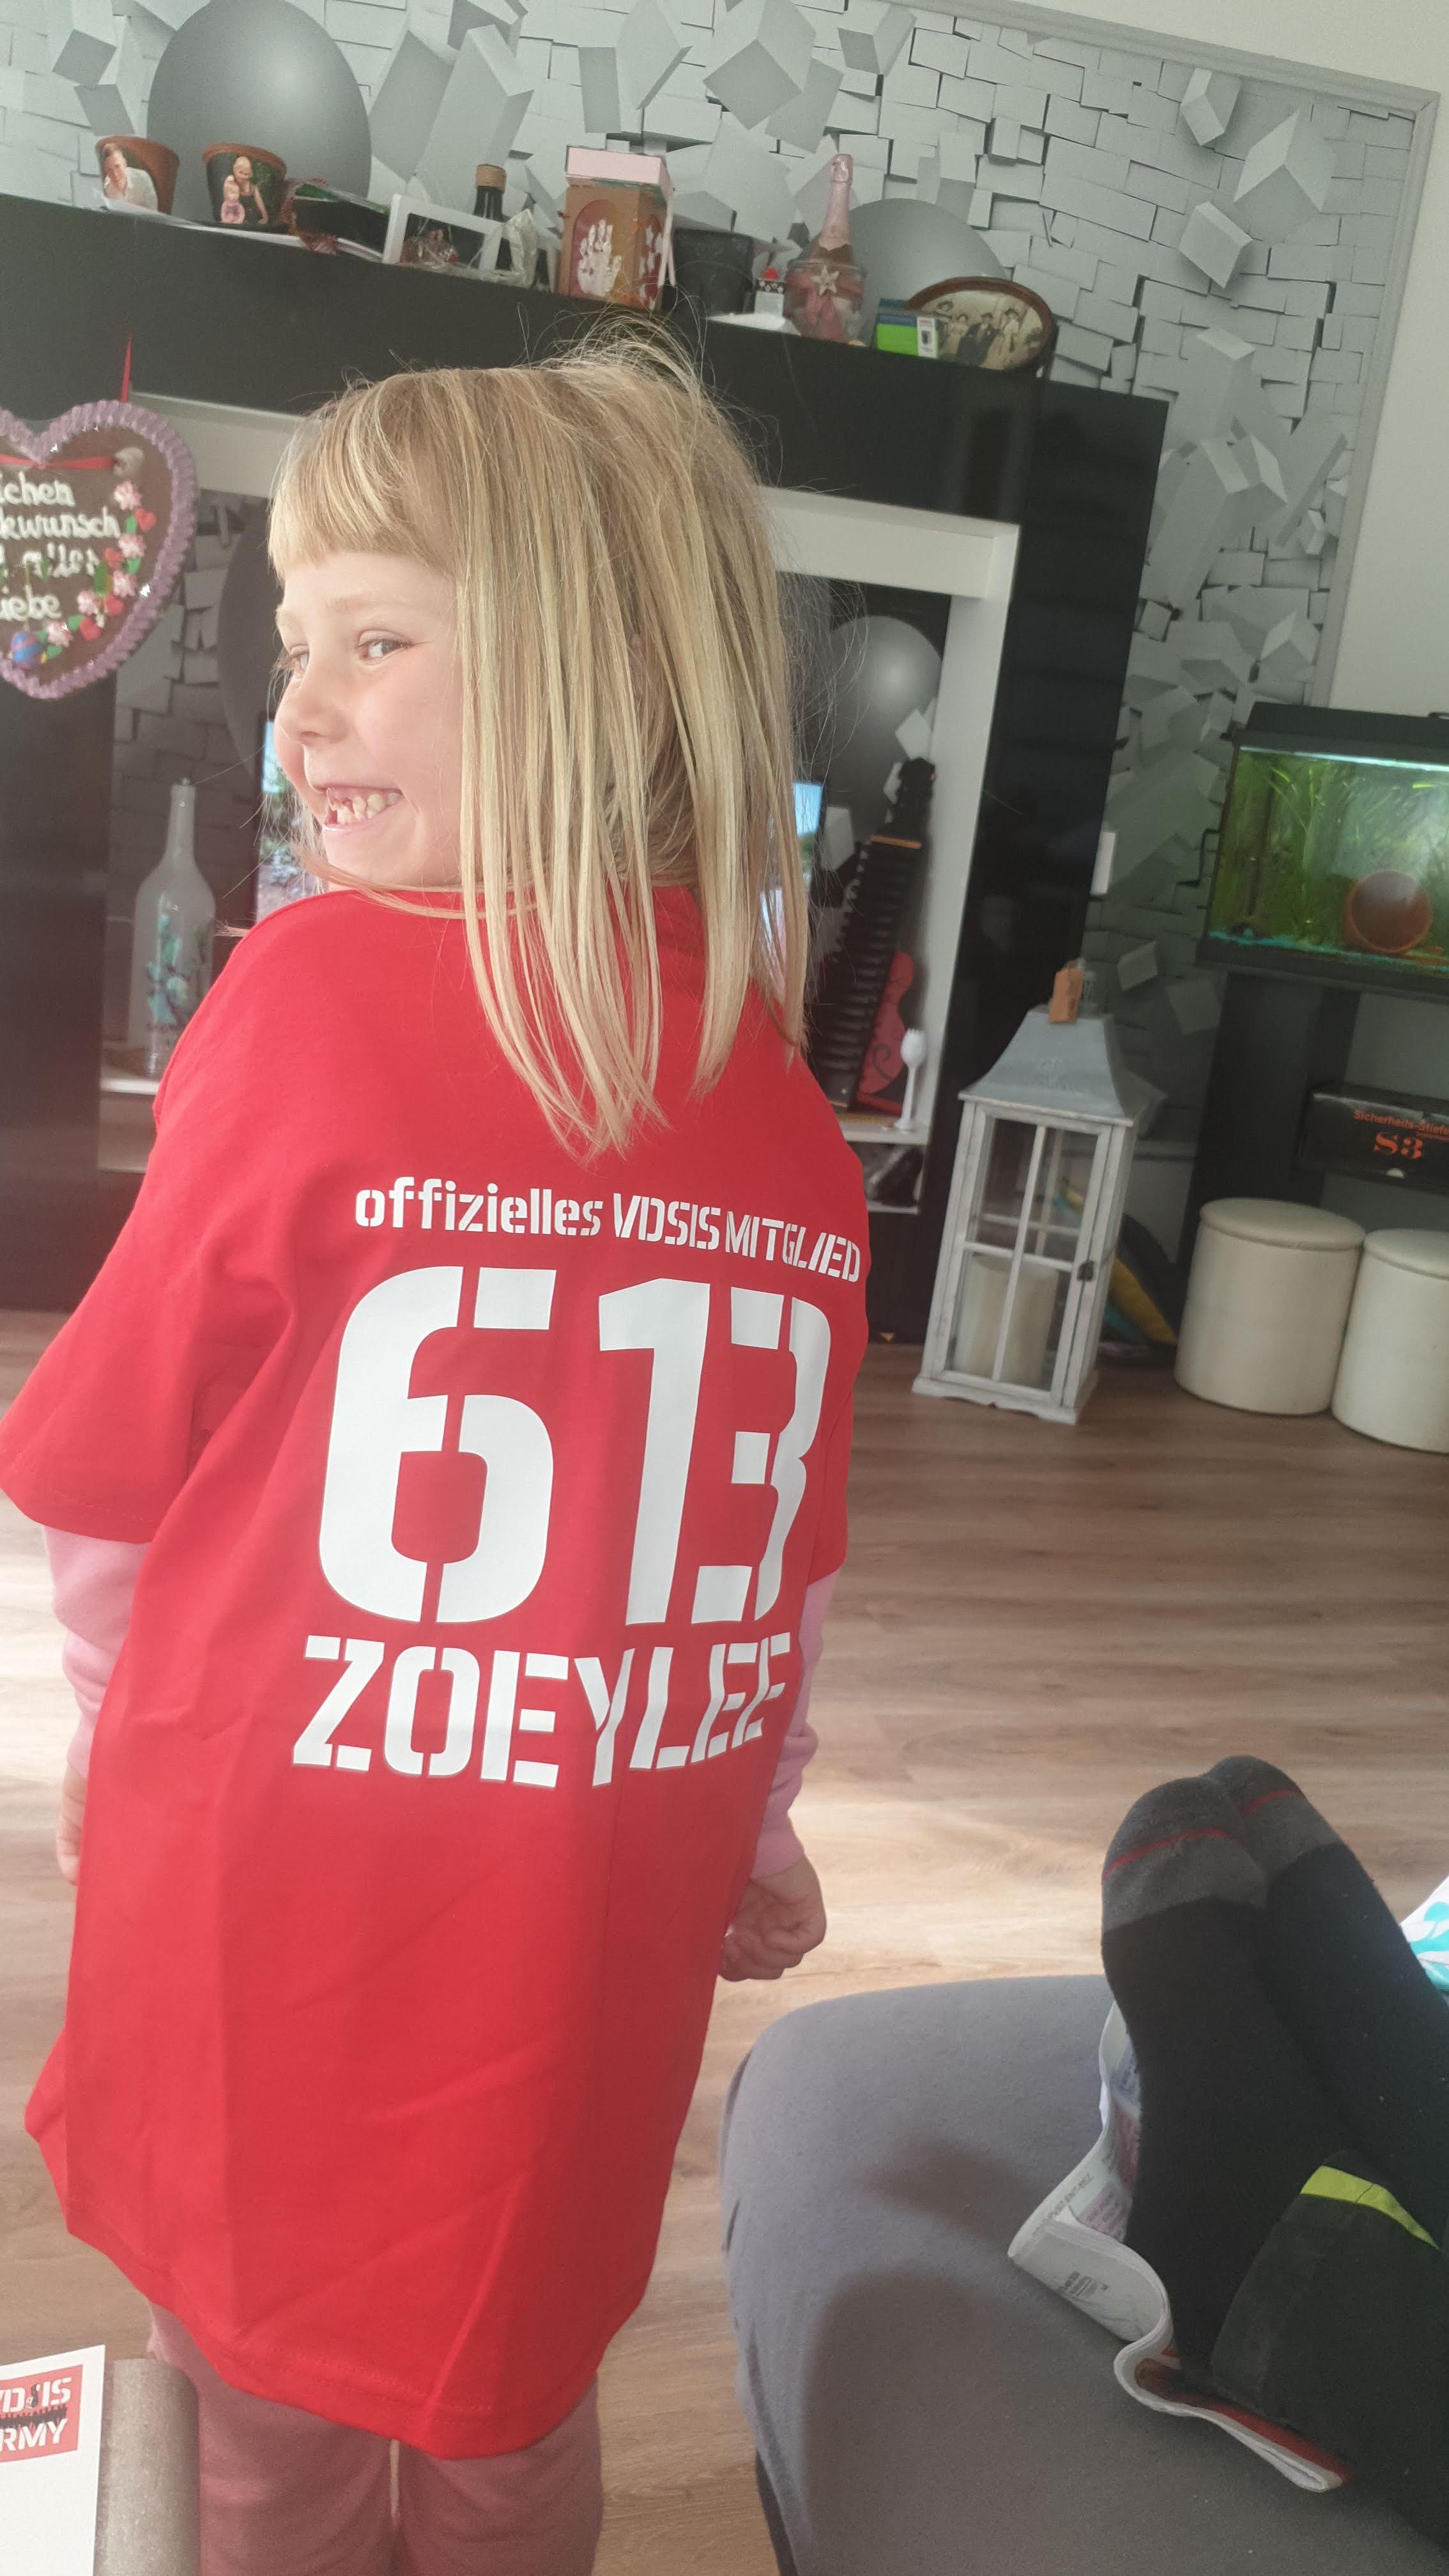 613 Zoey Lee vdsisarmy